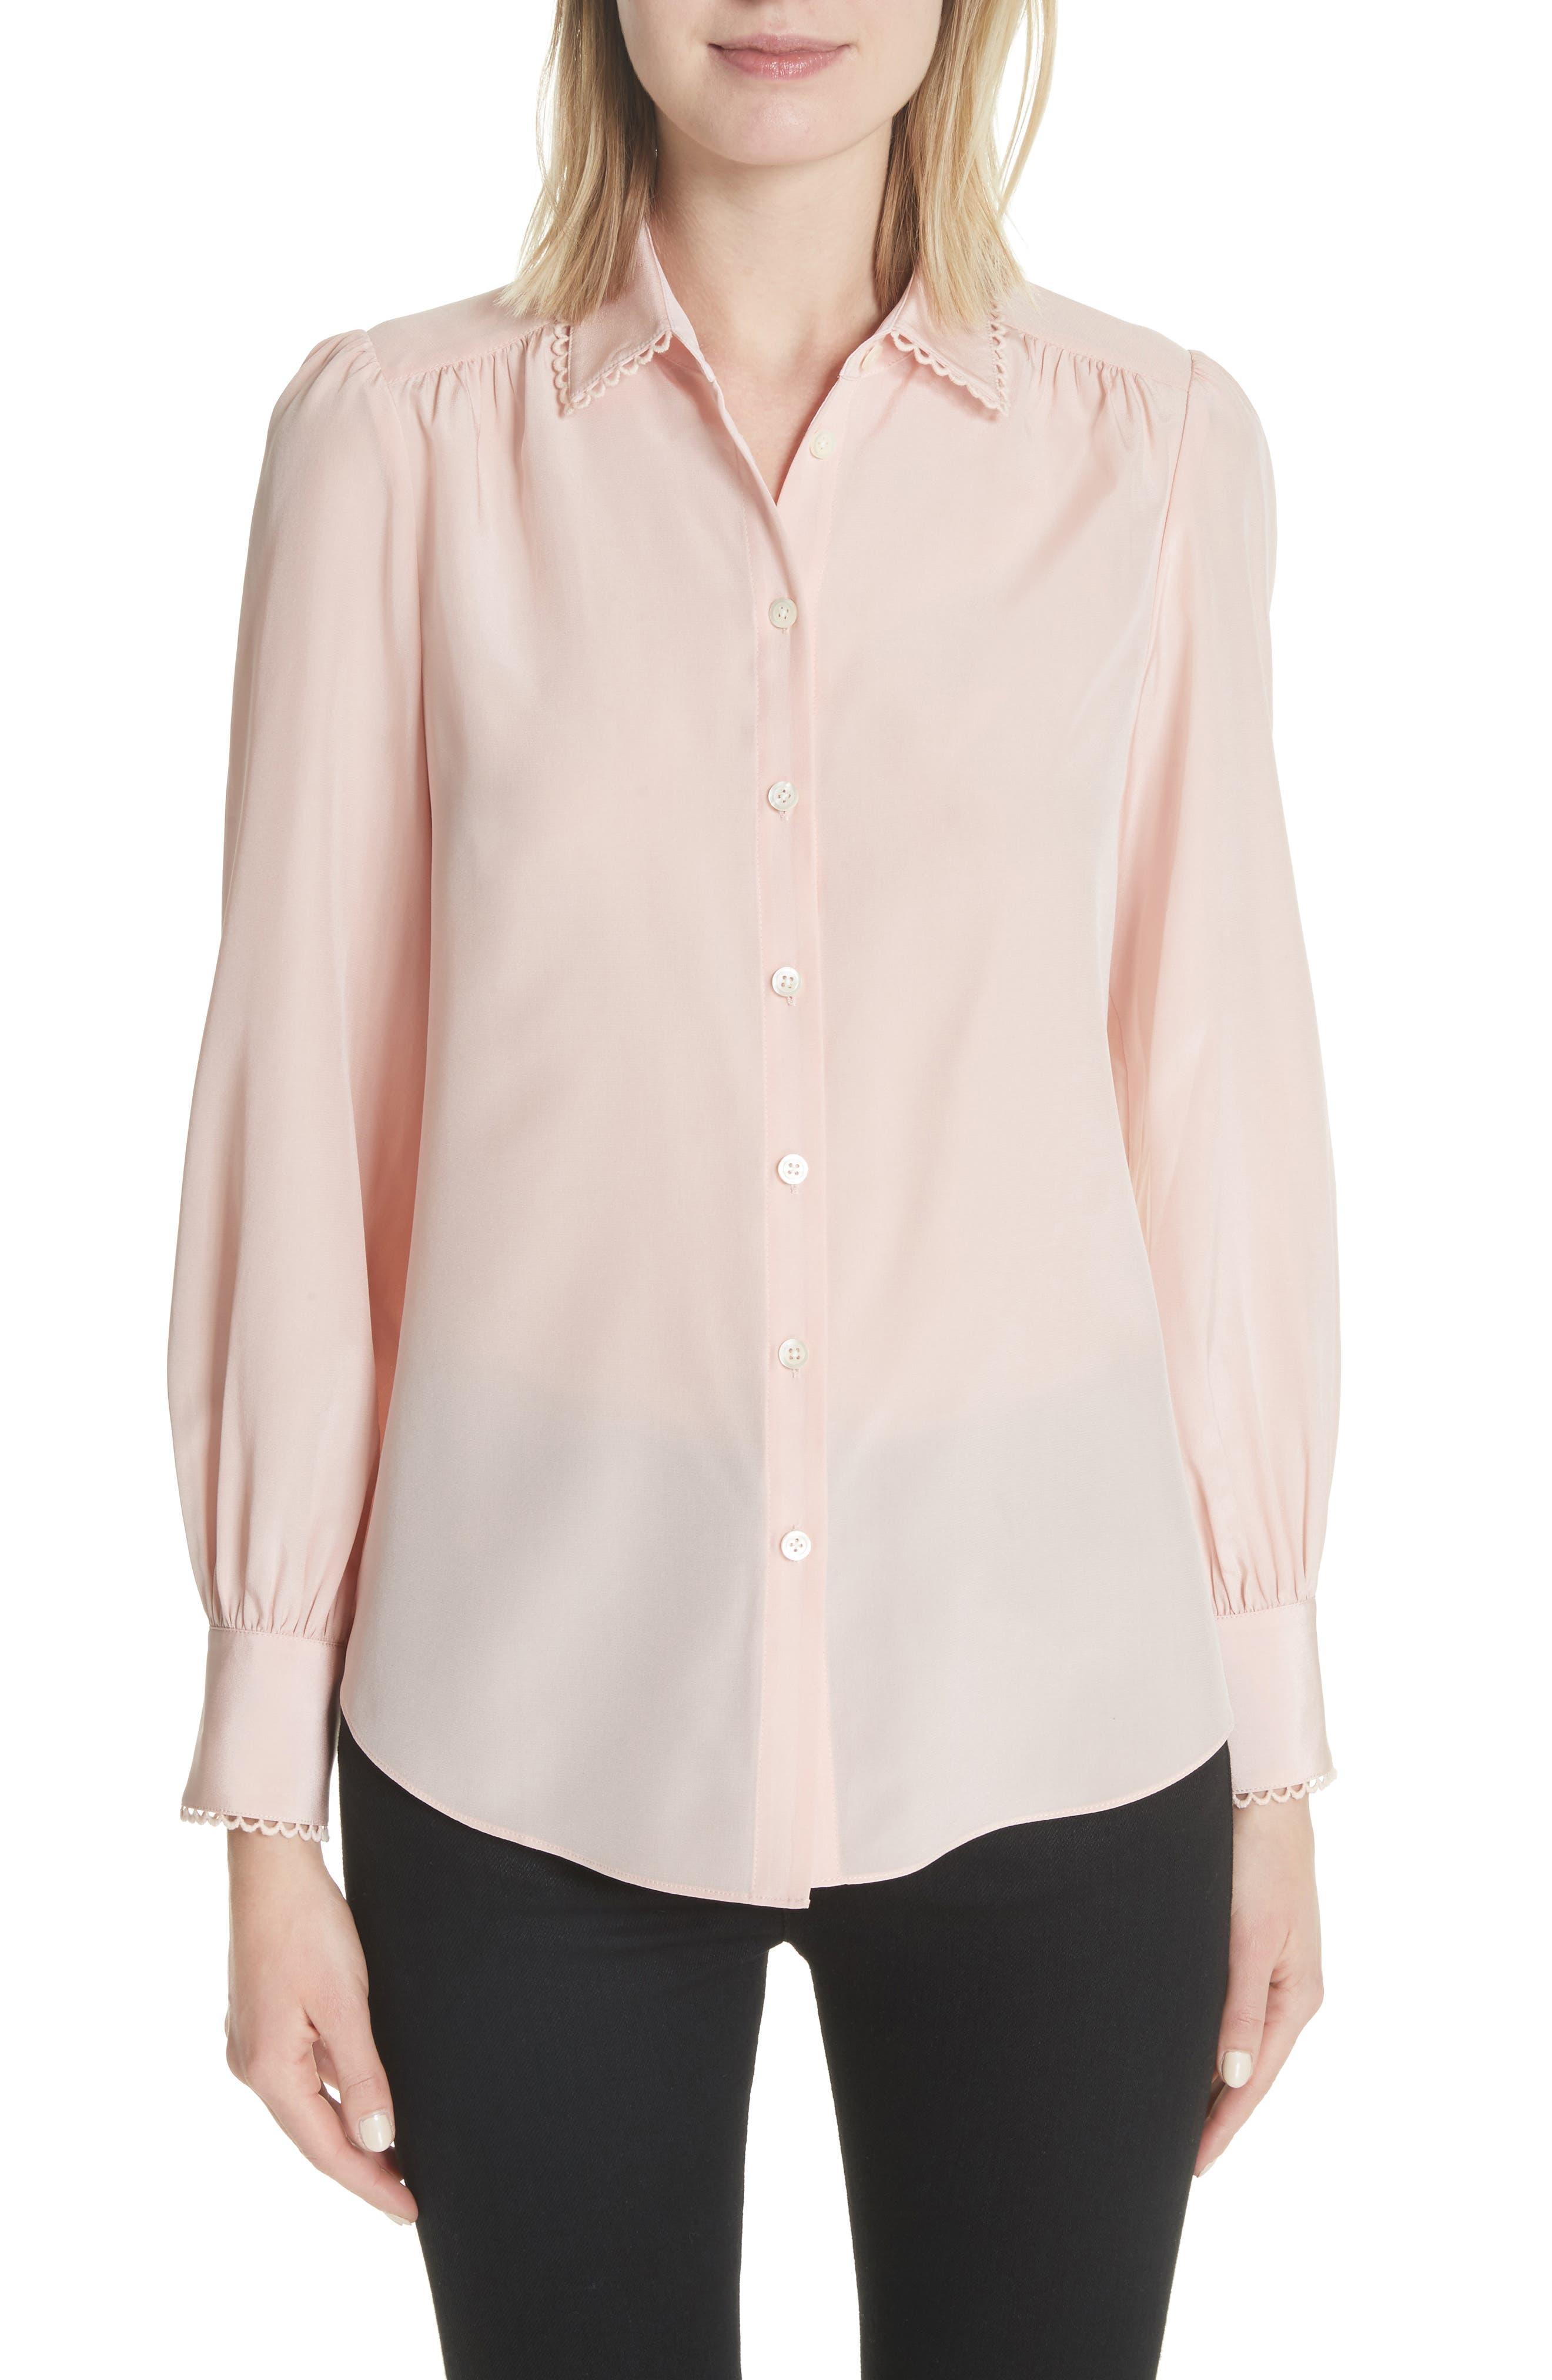 KATE SPADE NEW YORK,                             scallop trim silk shirt,                             Main thumbnail 1, color,                             663